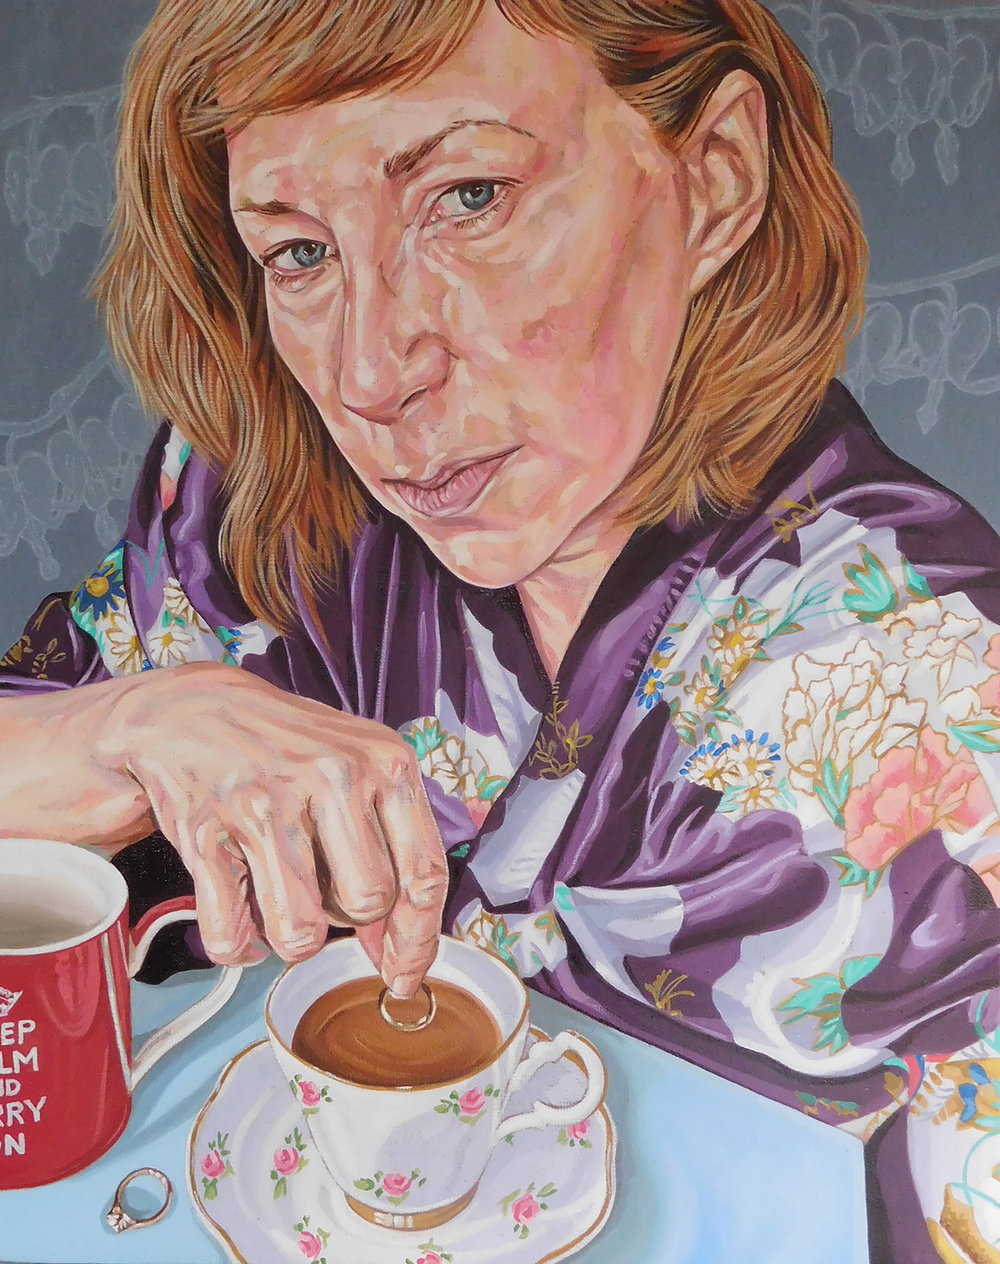 Artworks_2018_Tea_for_Two_by_Lyn_Aylward.jpg